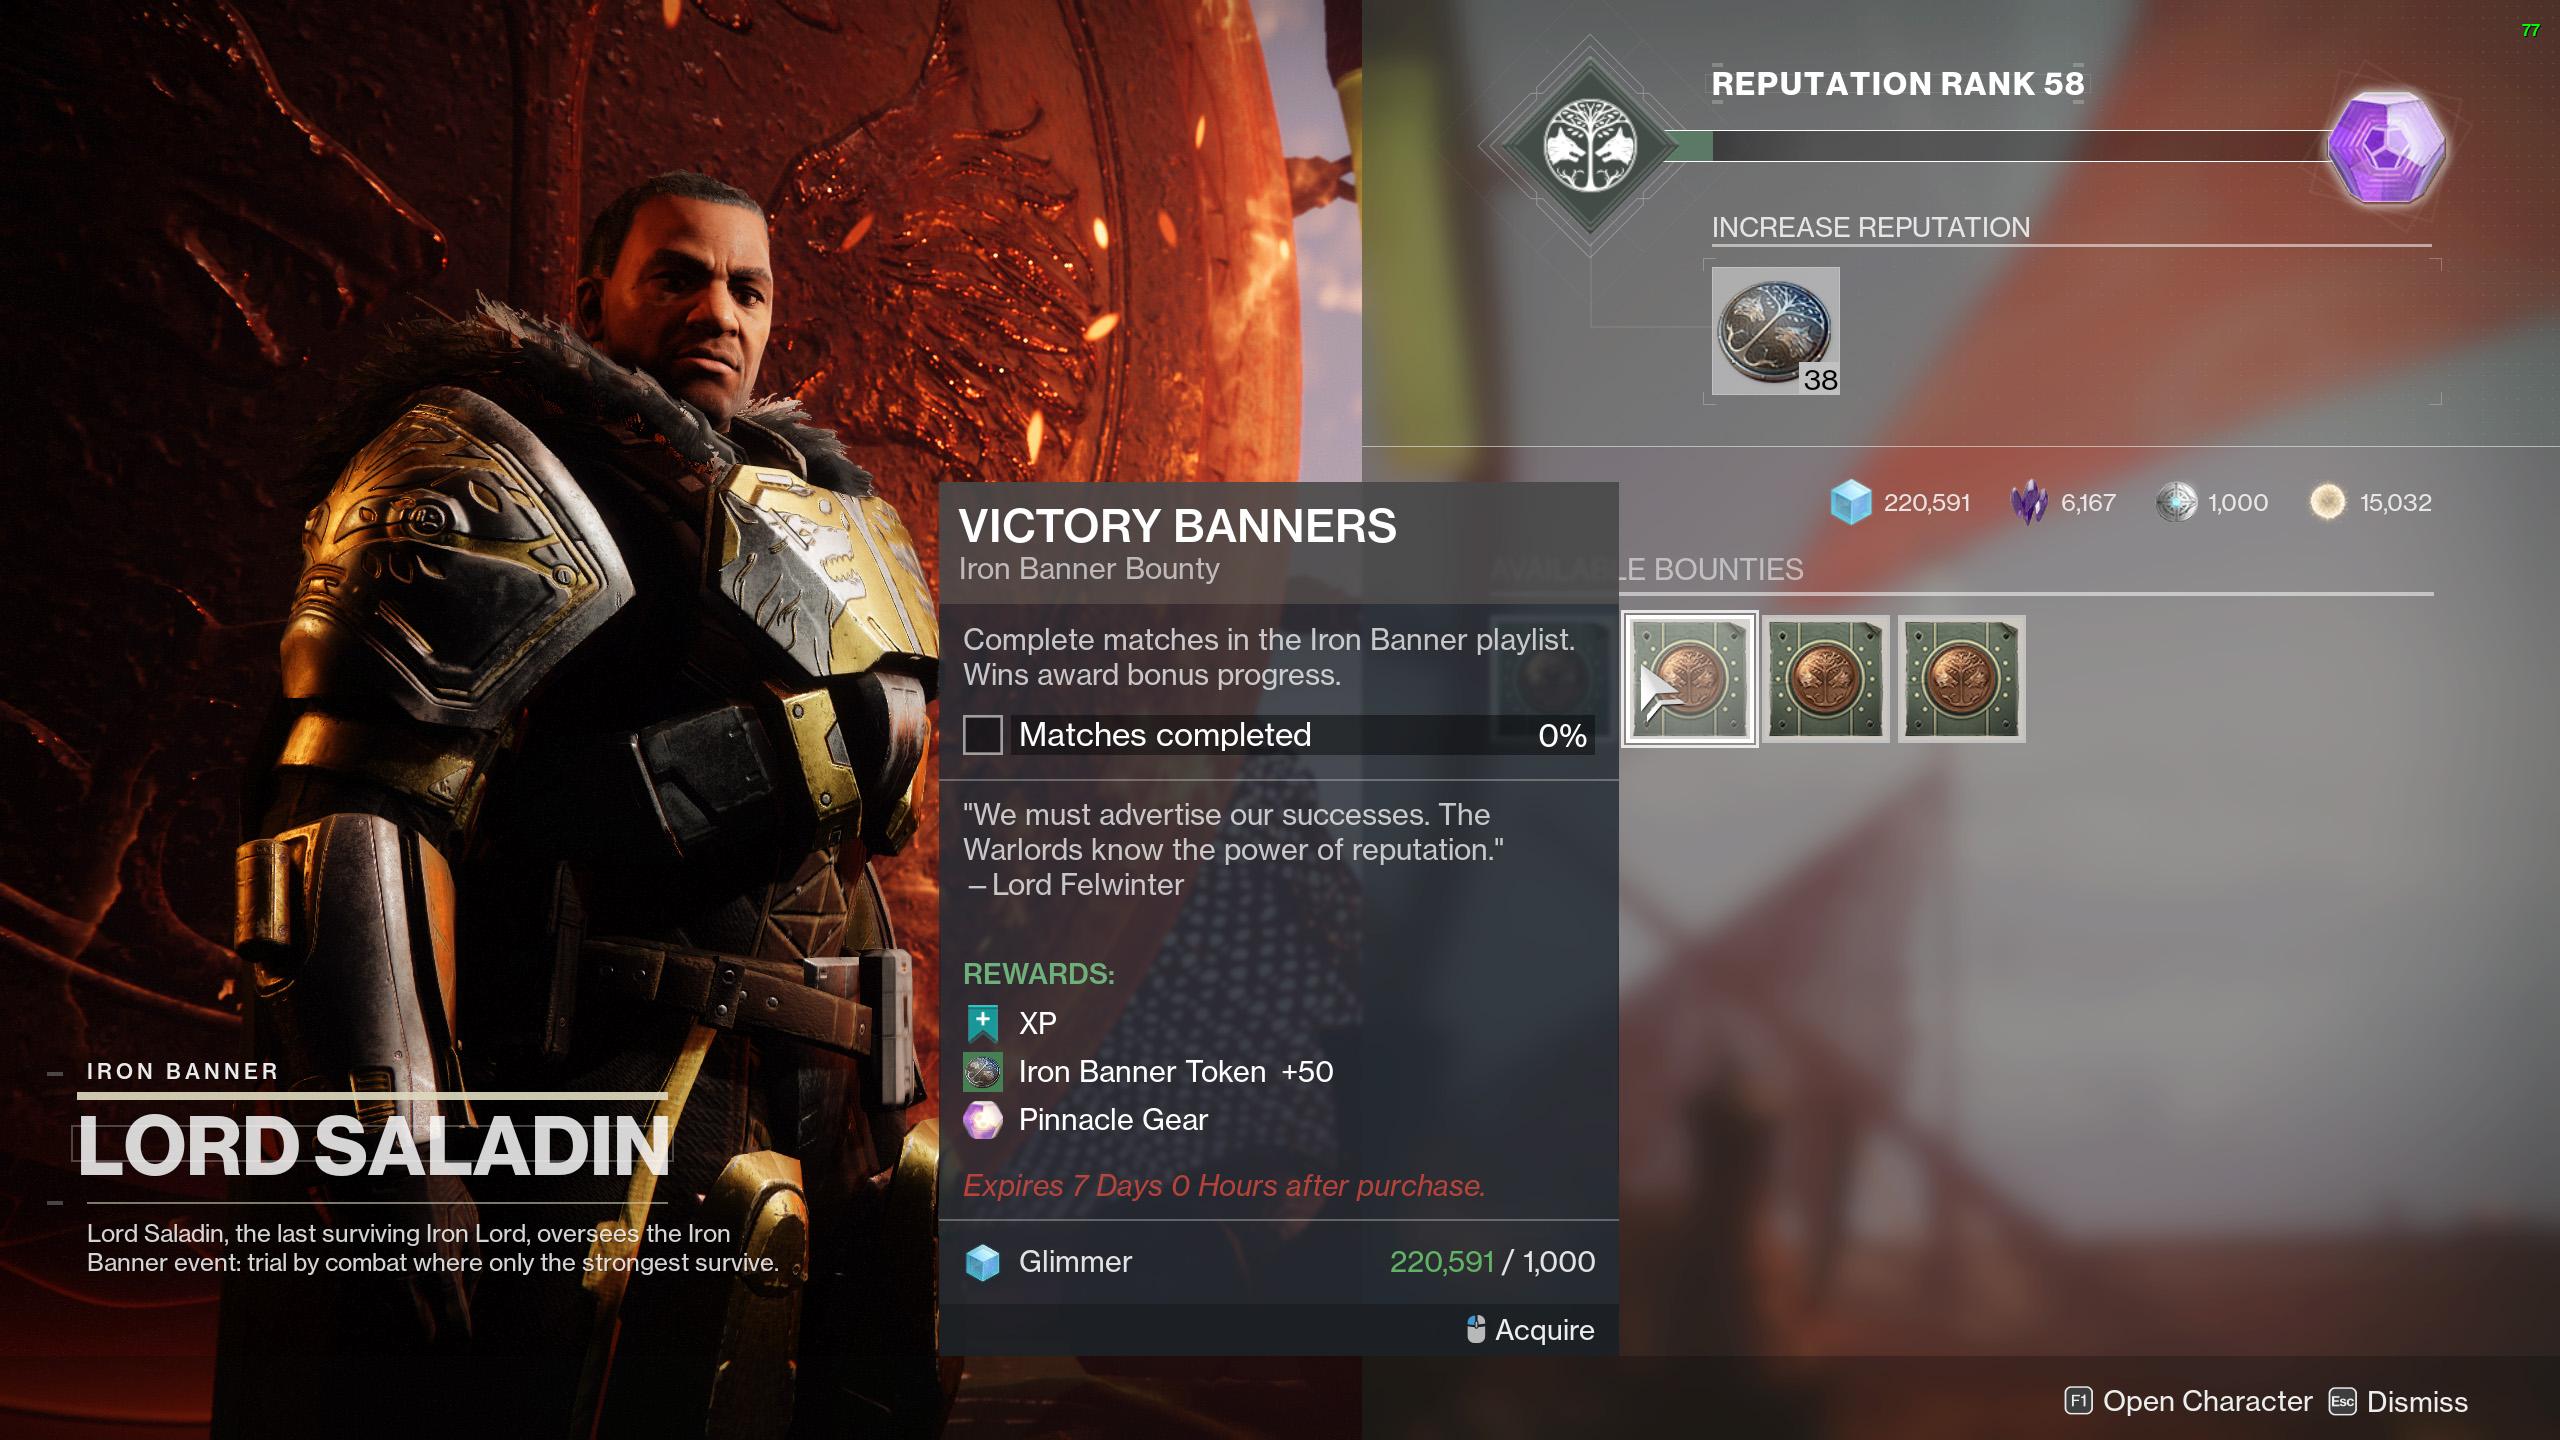 destiny 2 iron banner season 14 bounties victory banners